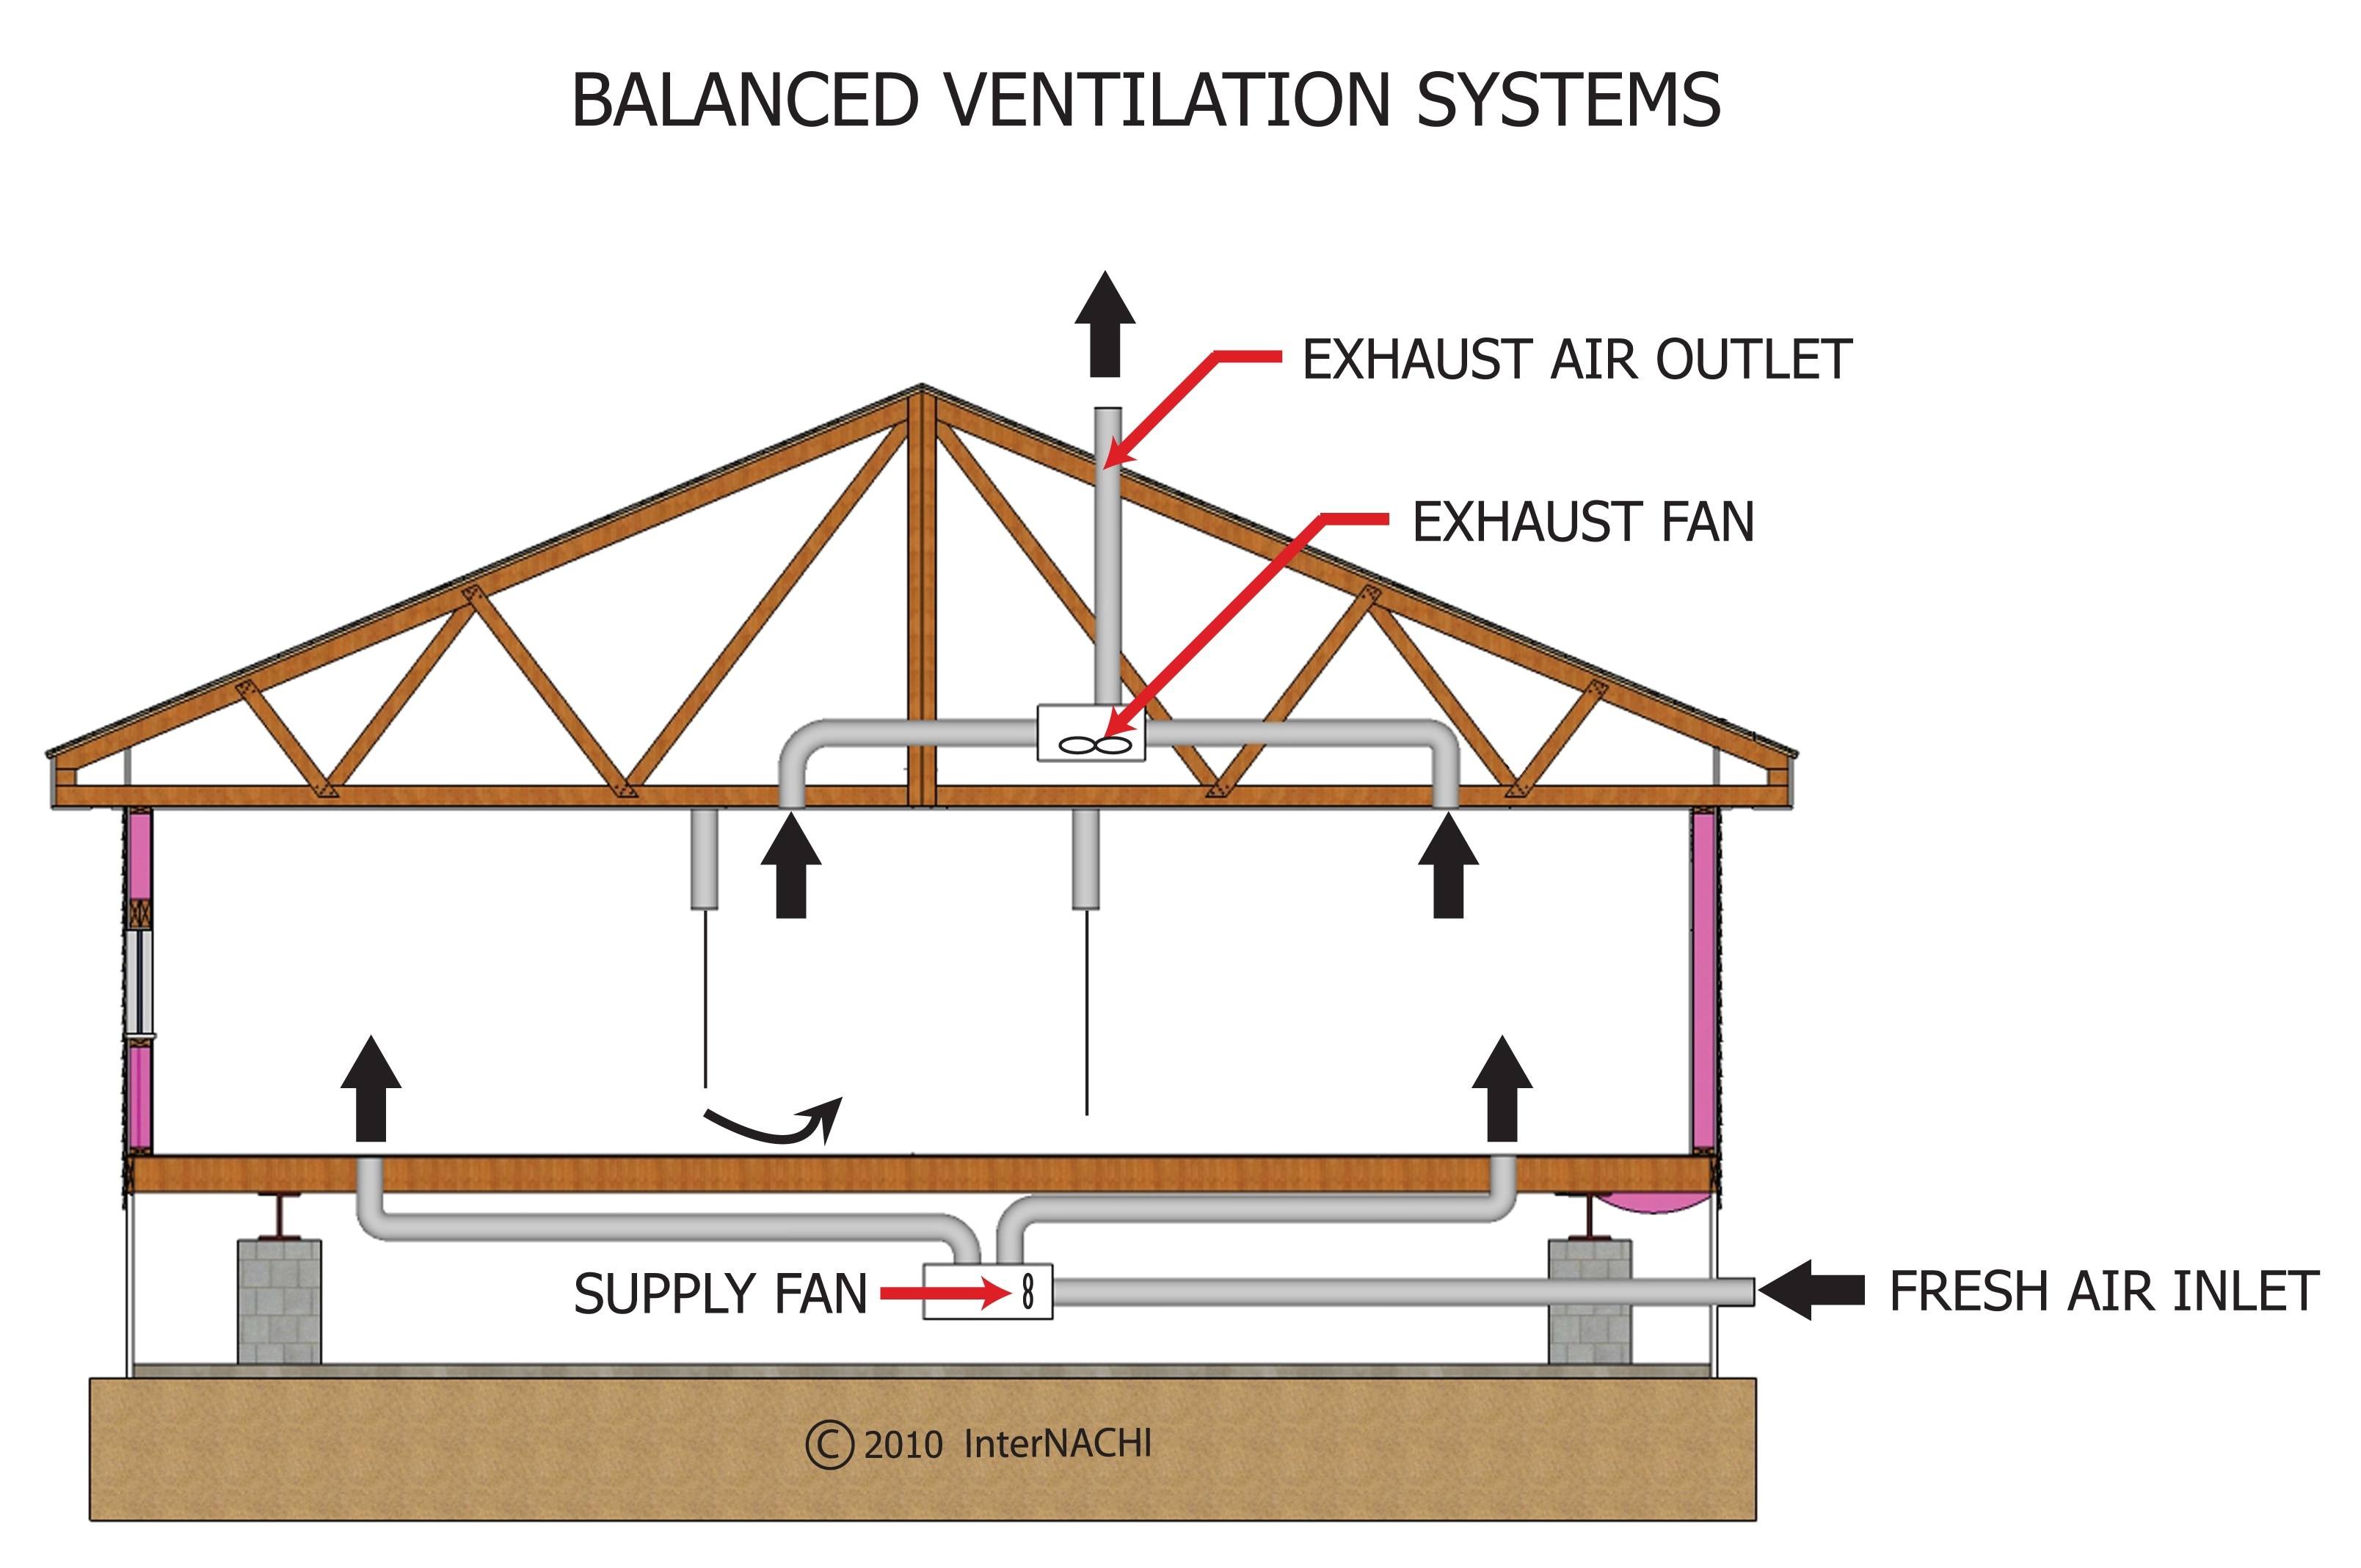 balanced ventilation..> 2010 06 13 13:47 601K #B4171A